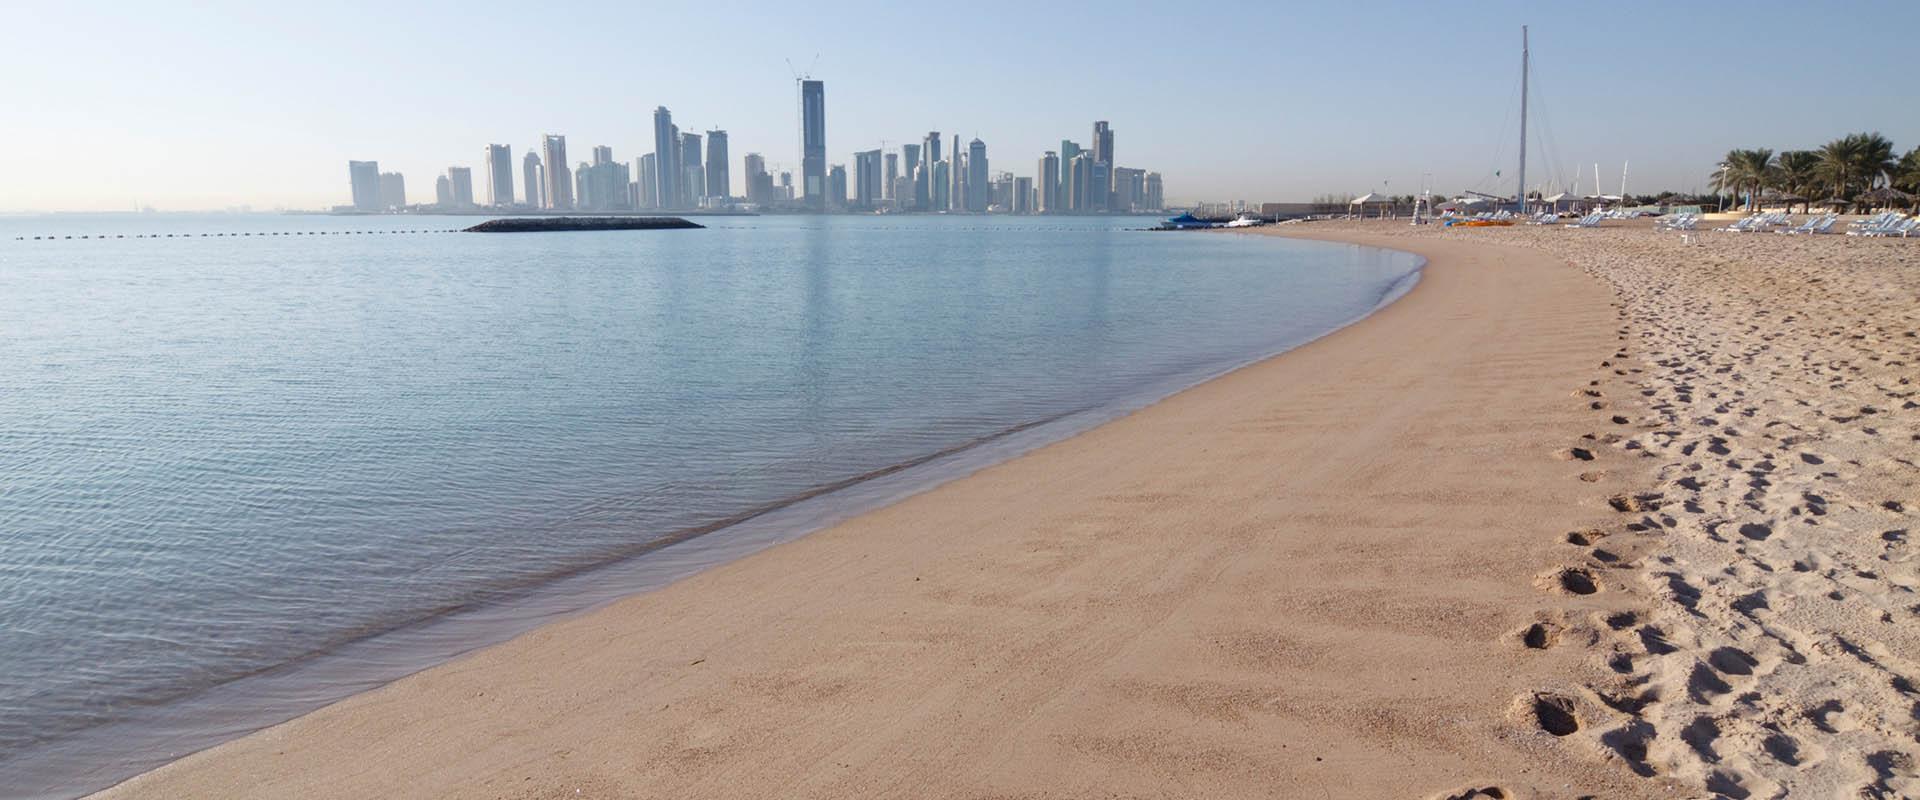 Download Qatar Eid Al-Fitr 2018 - Qatar_1920_800_homepage  Snapshot_469285 .jpg